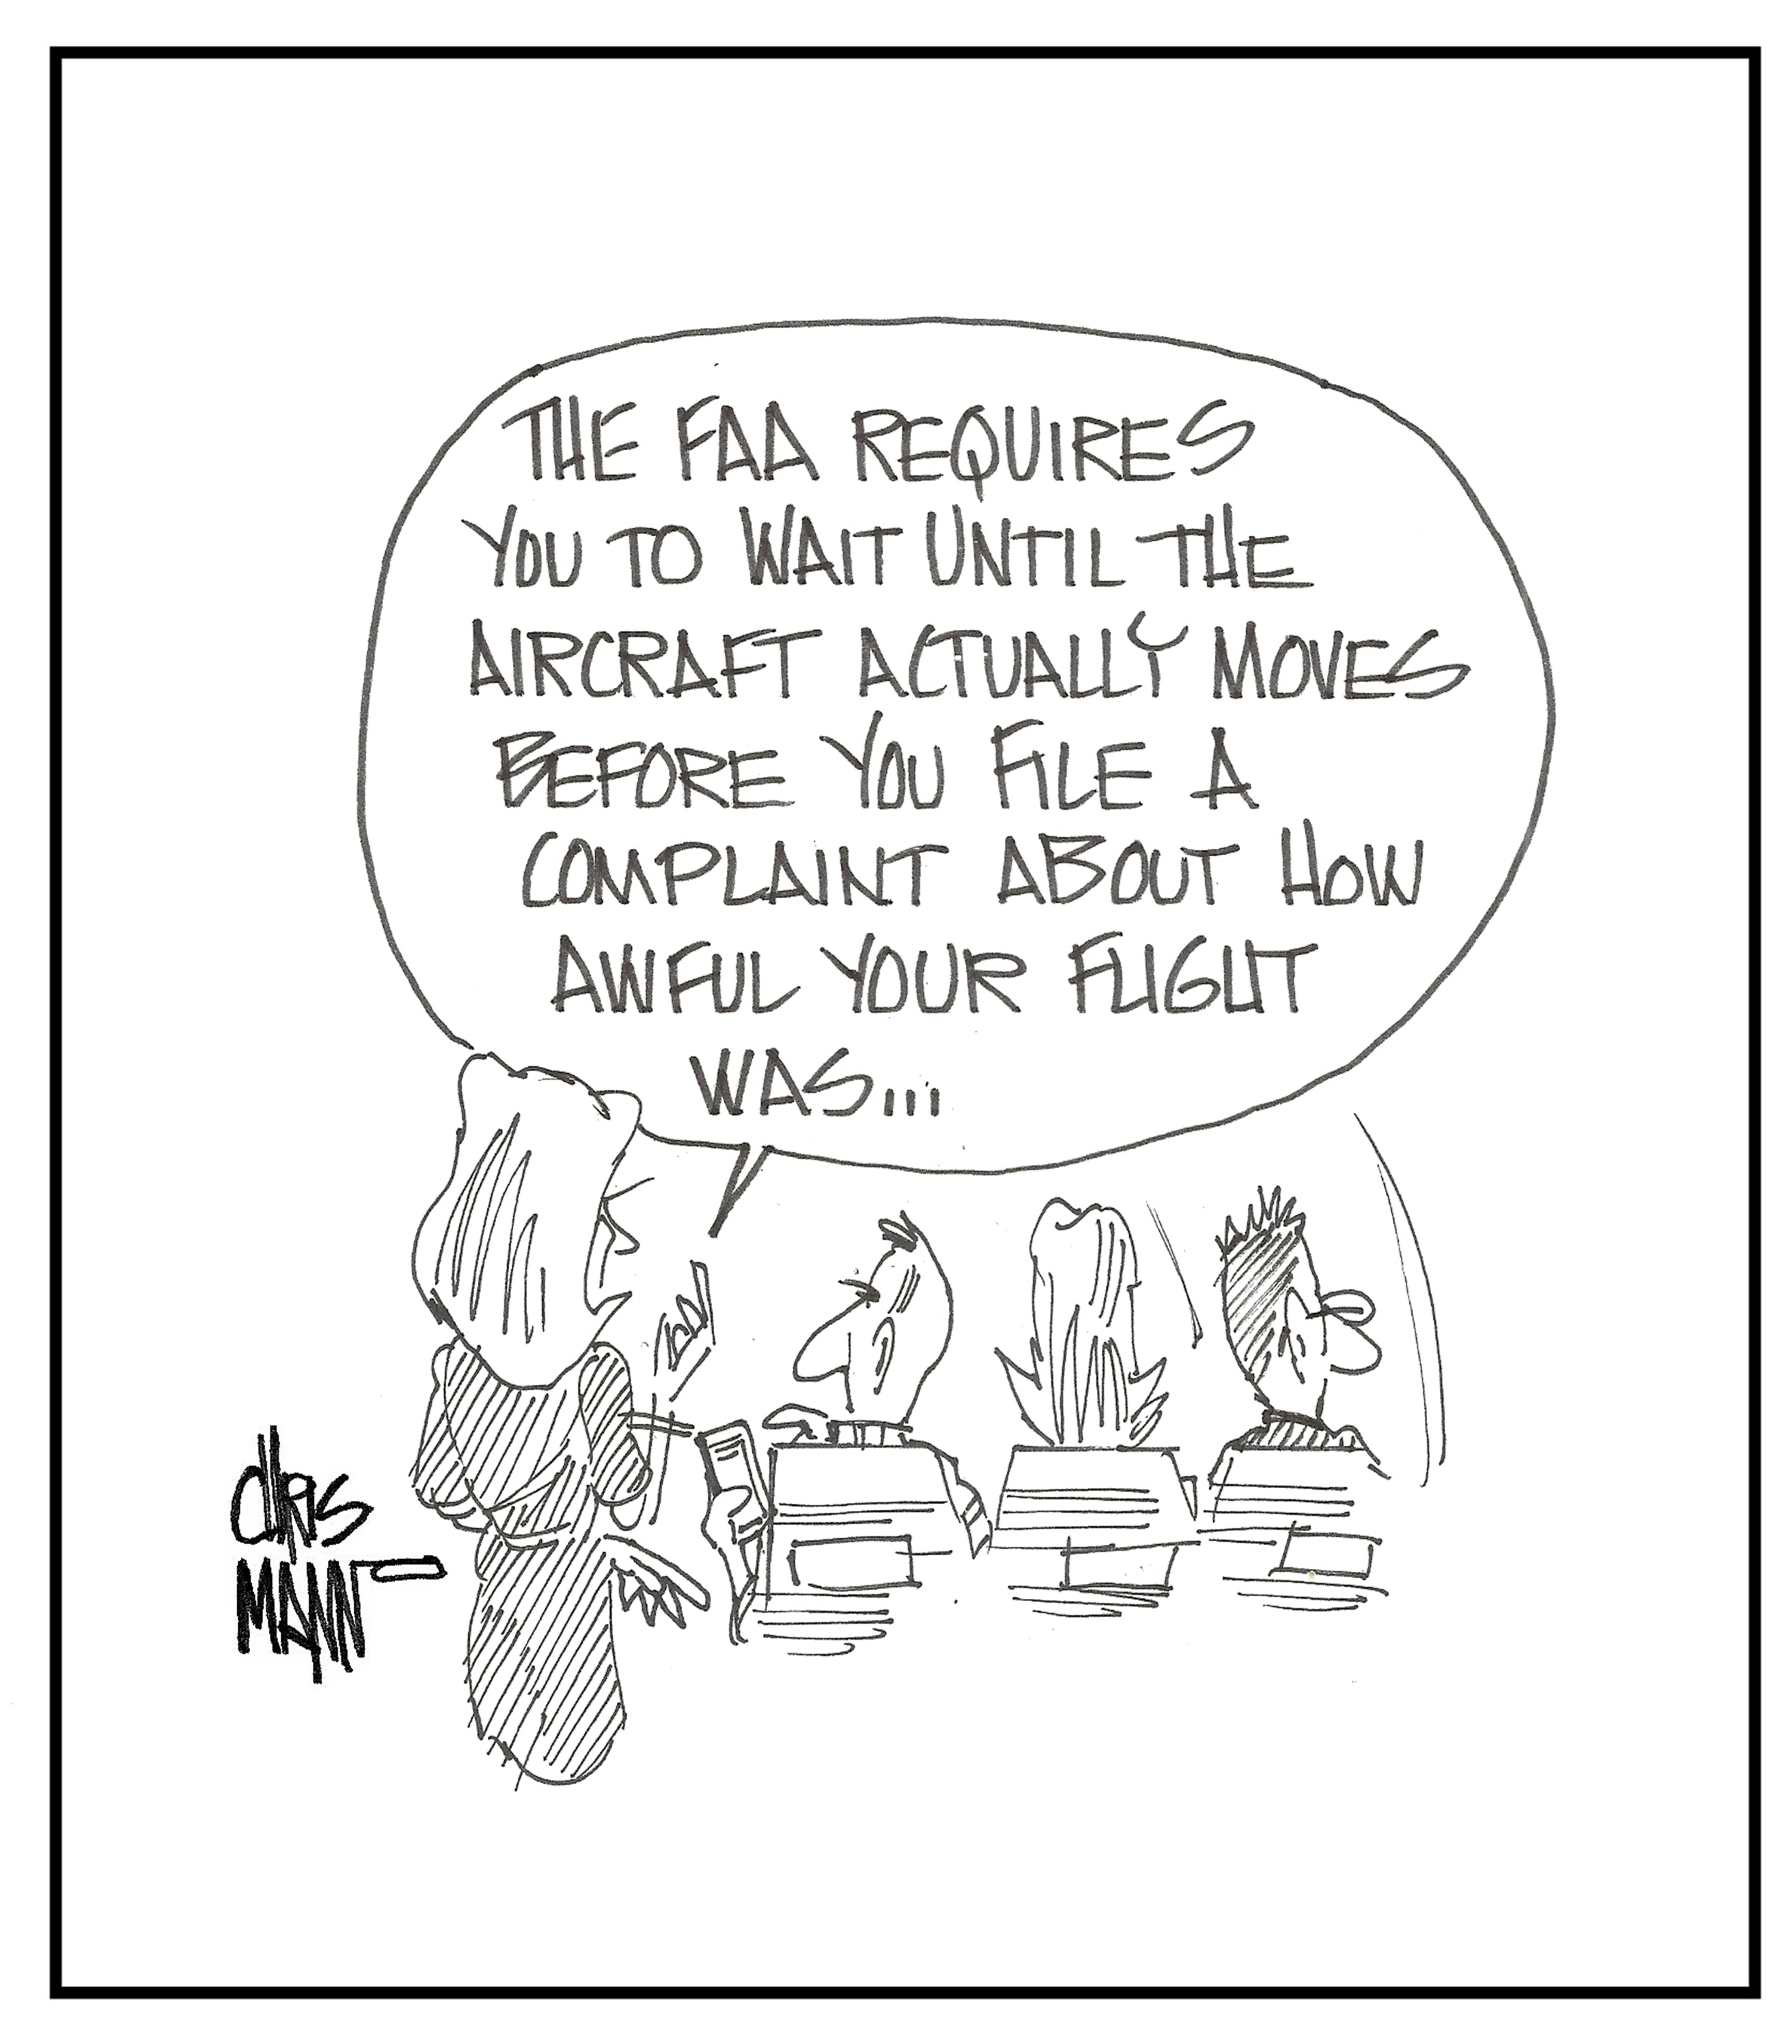 air complaint